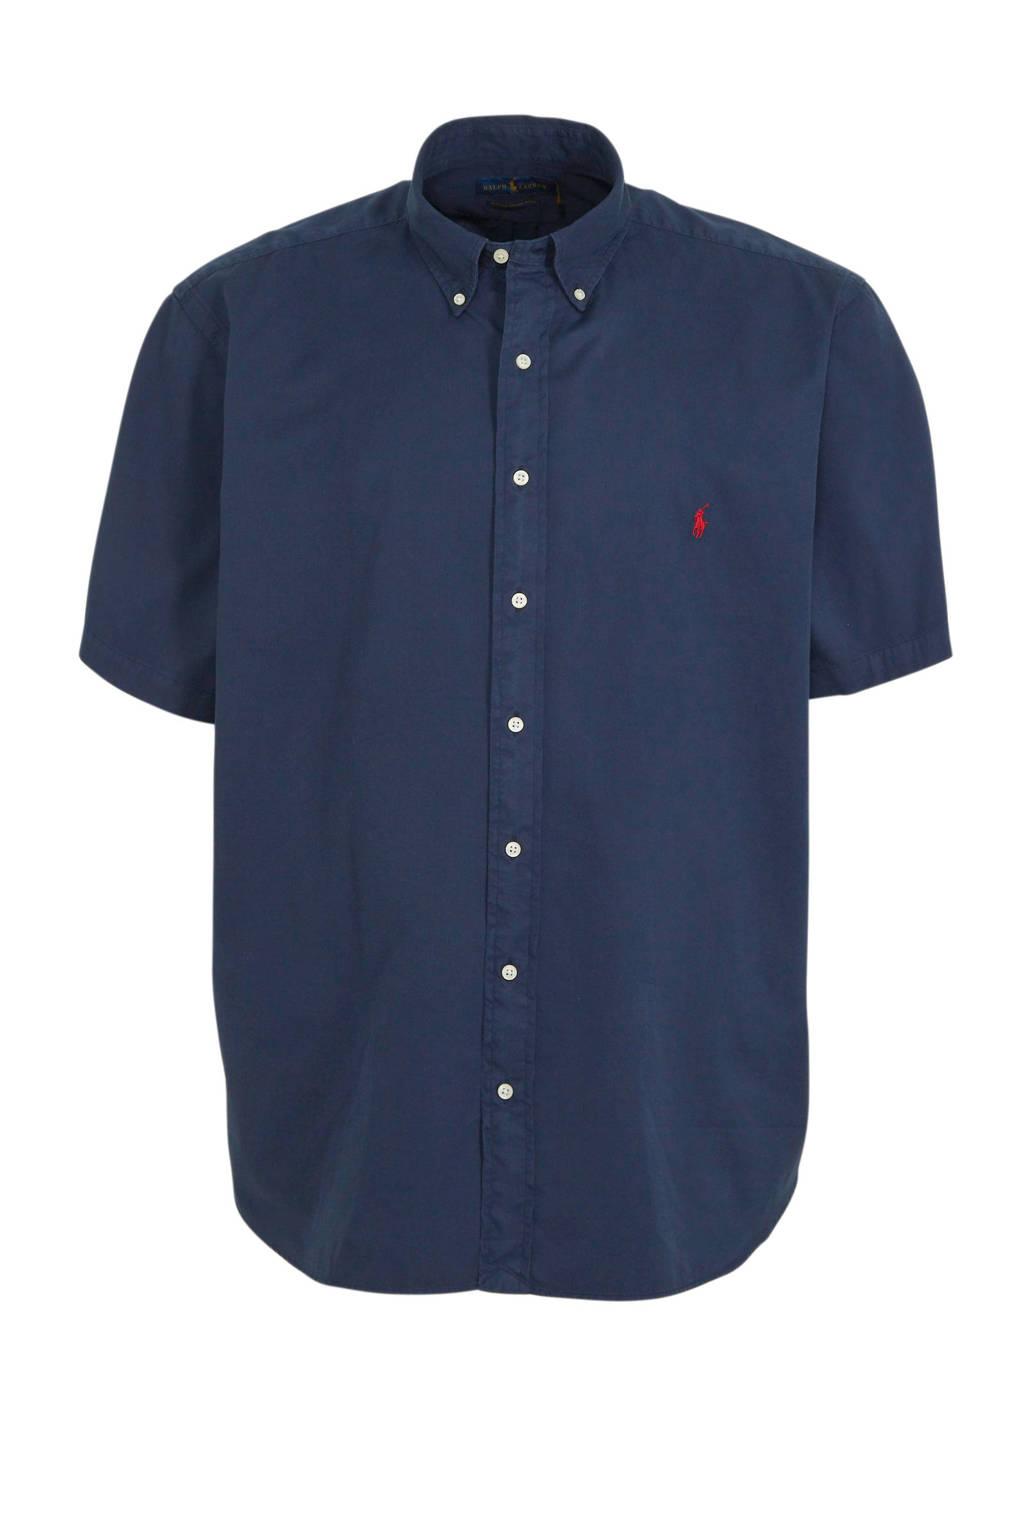 POLO Ralph Lauren Big & Tall +size regular fit overhemd donkerblauw, Donkerblauw